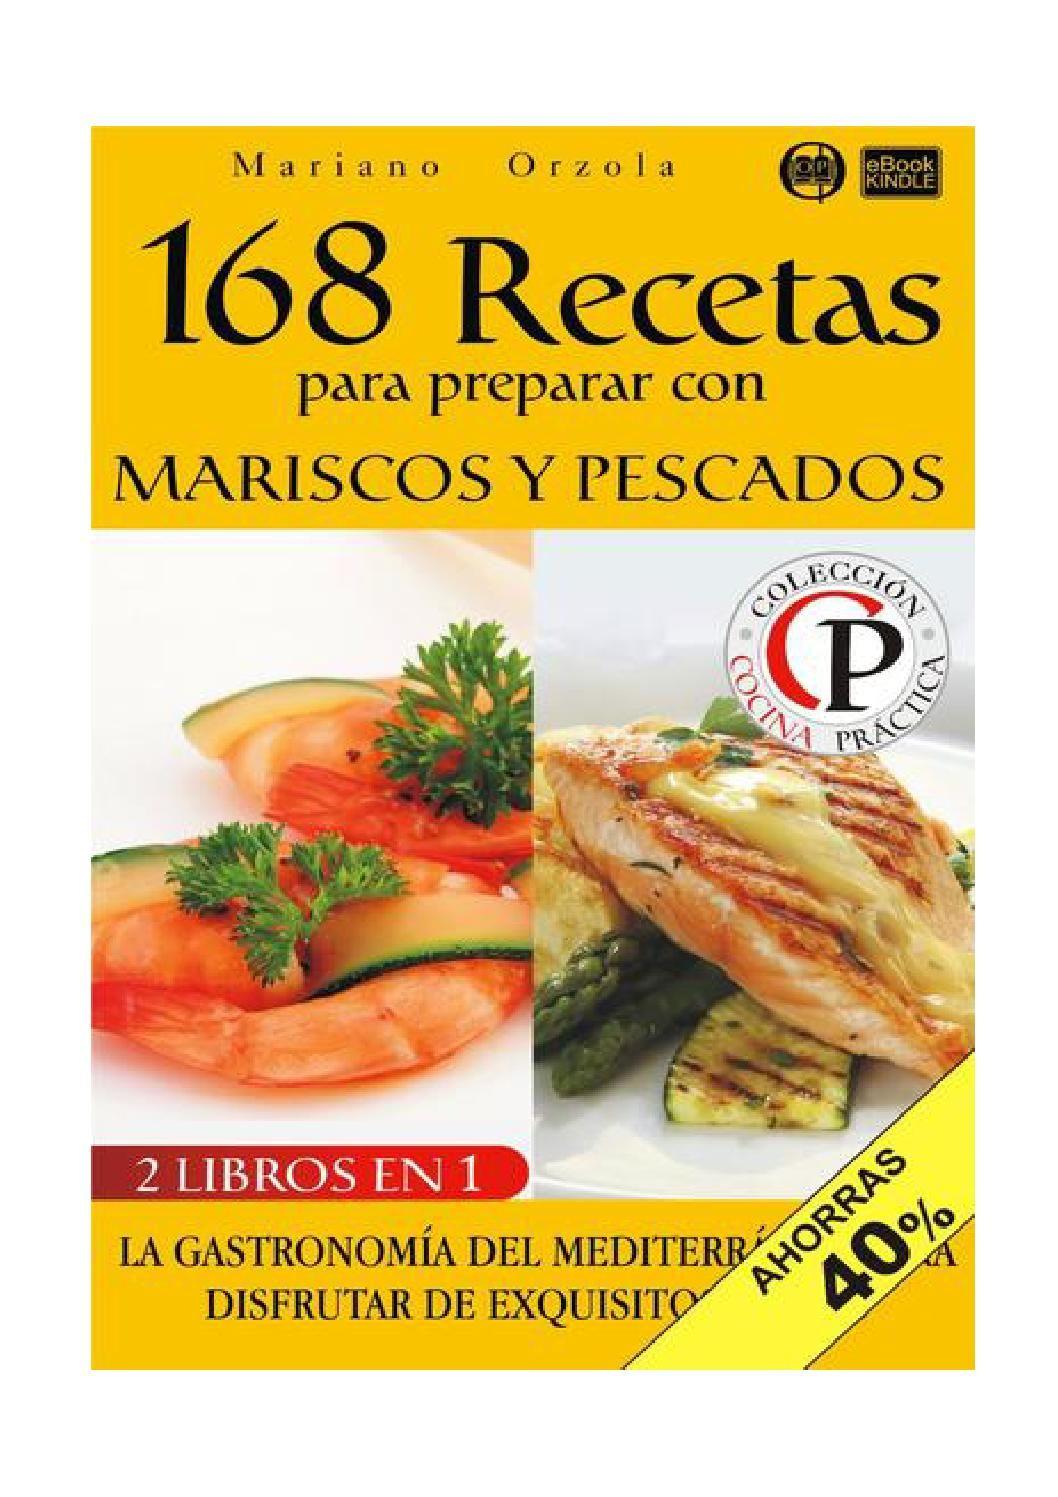 2dcbf4c7ff8681a0309cff3bb402c091 - Cocinar Recetas